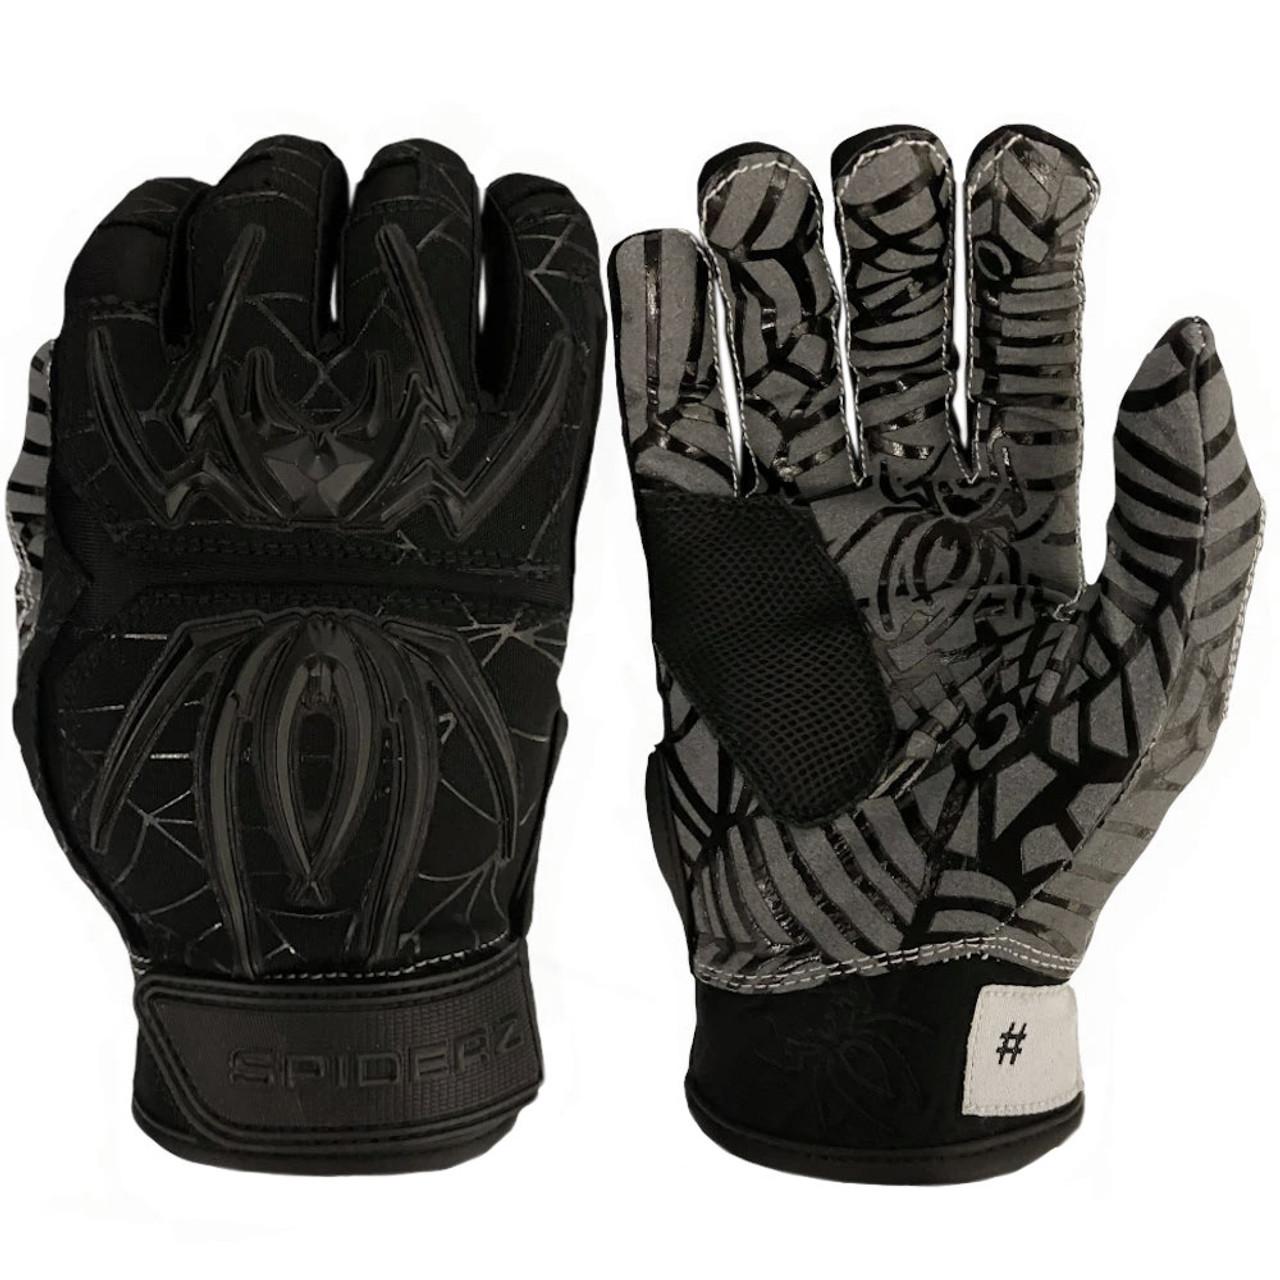 Black//Silver Medium Spiderz 2021 Hybrid Baseball//Softball Batting Gloves